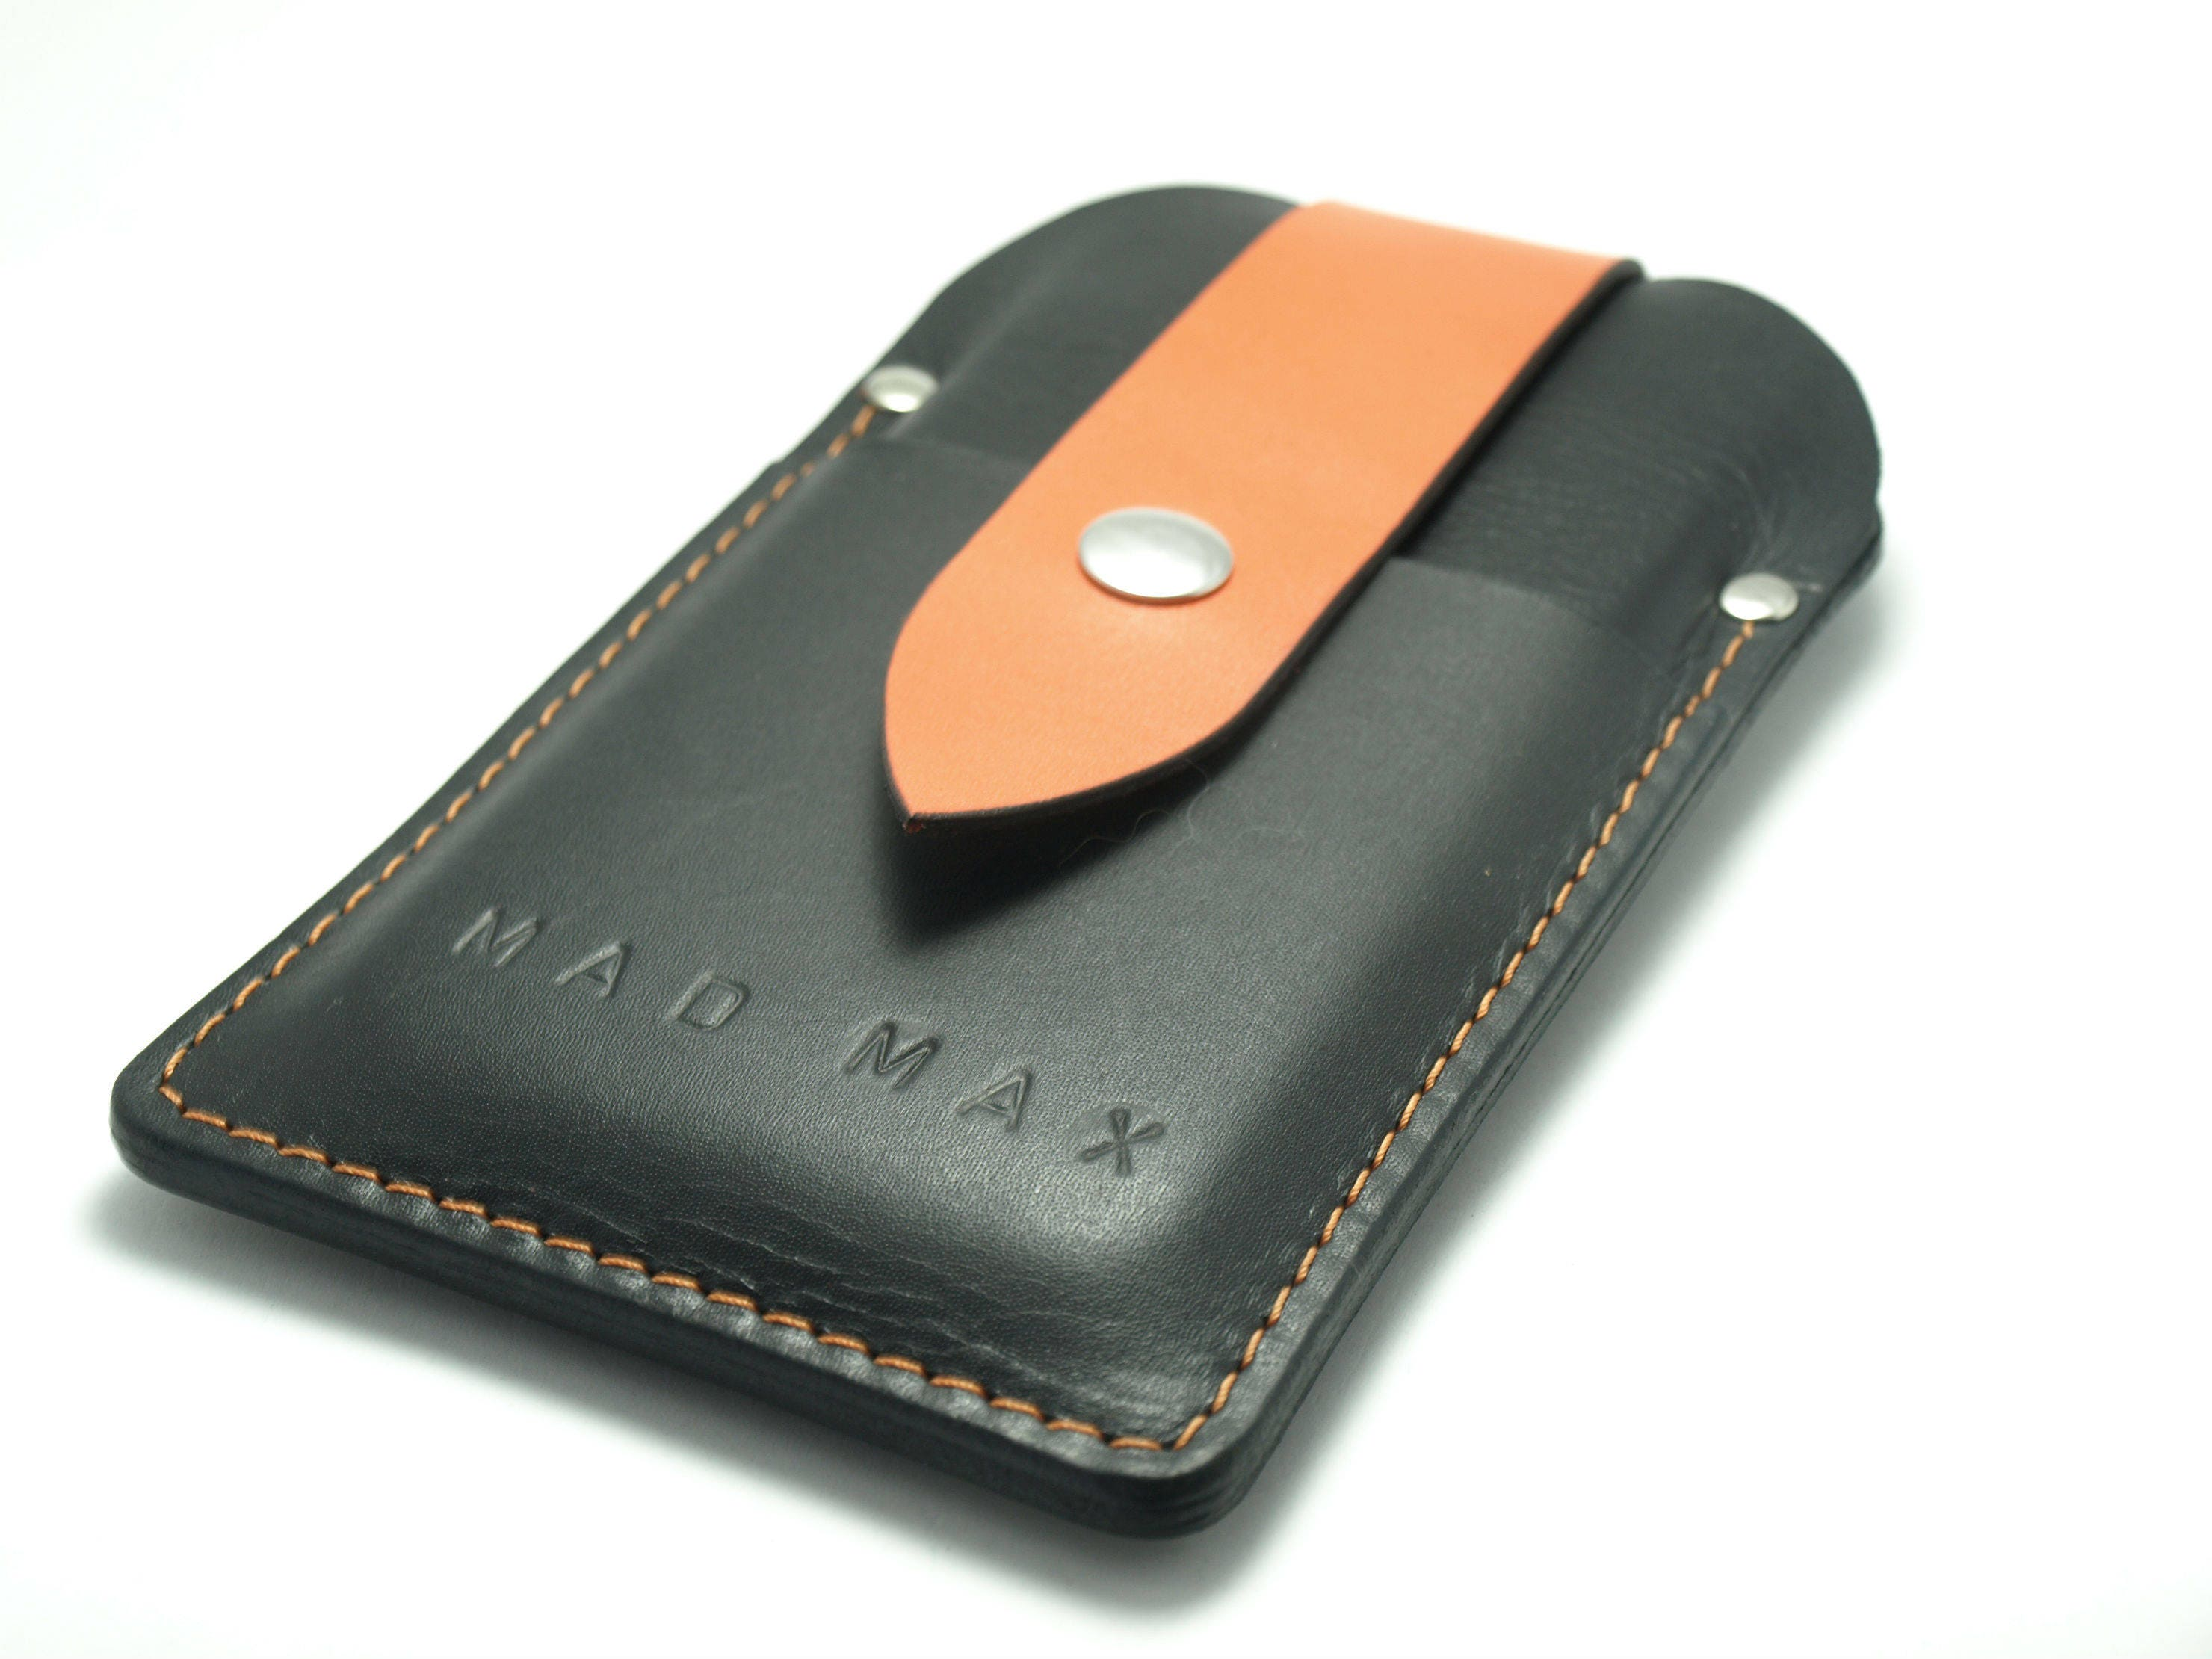 HARLEY DAVIDSON COLOR Handmade cow leather sleeve iPhone 6 7 8